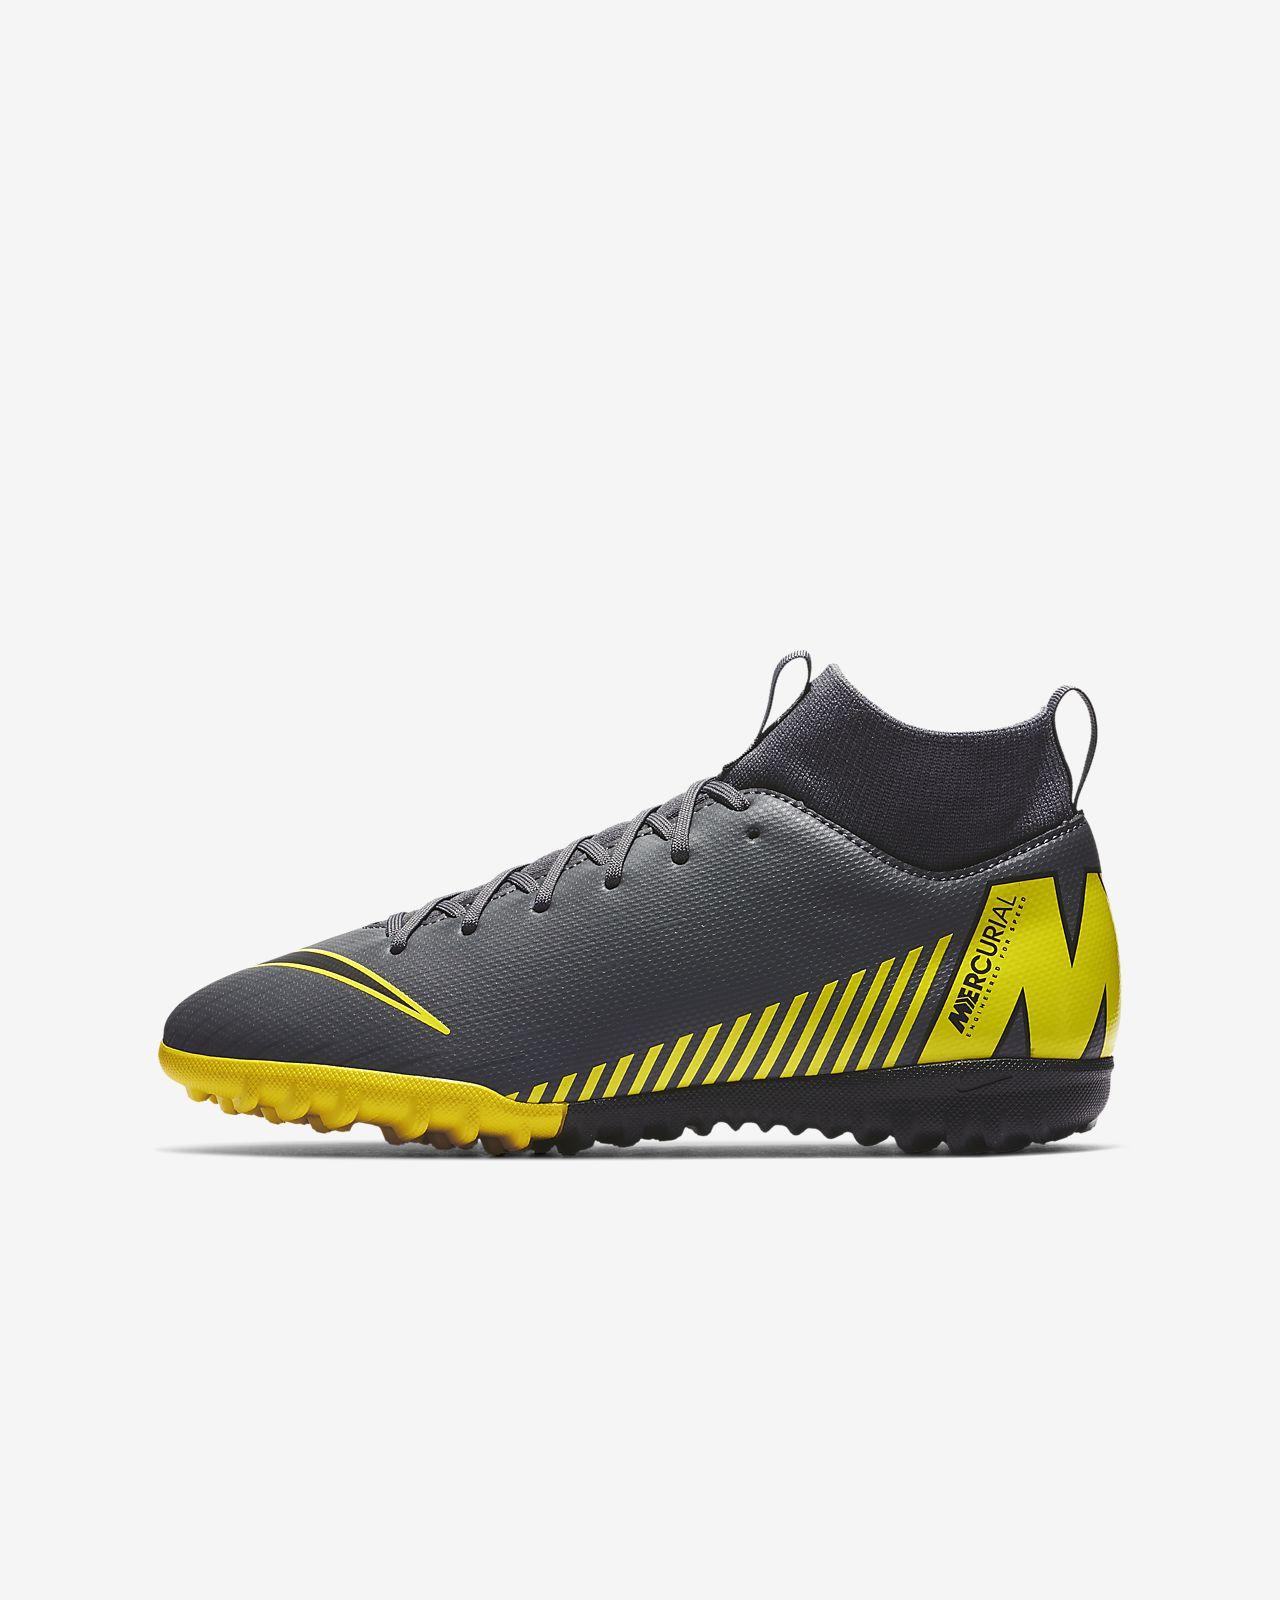 cab47c2322503 ... Nike Jr. SuperflyX 6 Academy TF Botas de fútbol para hierba artificial  o moqueta -